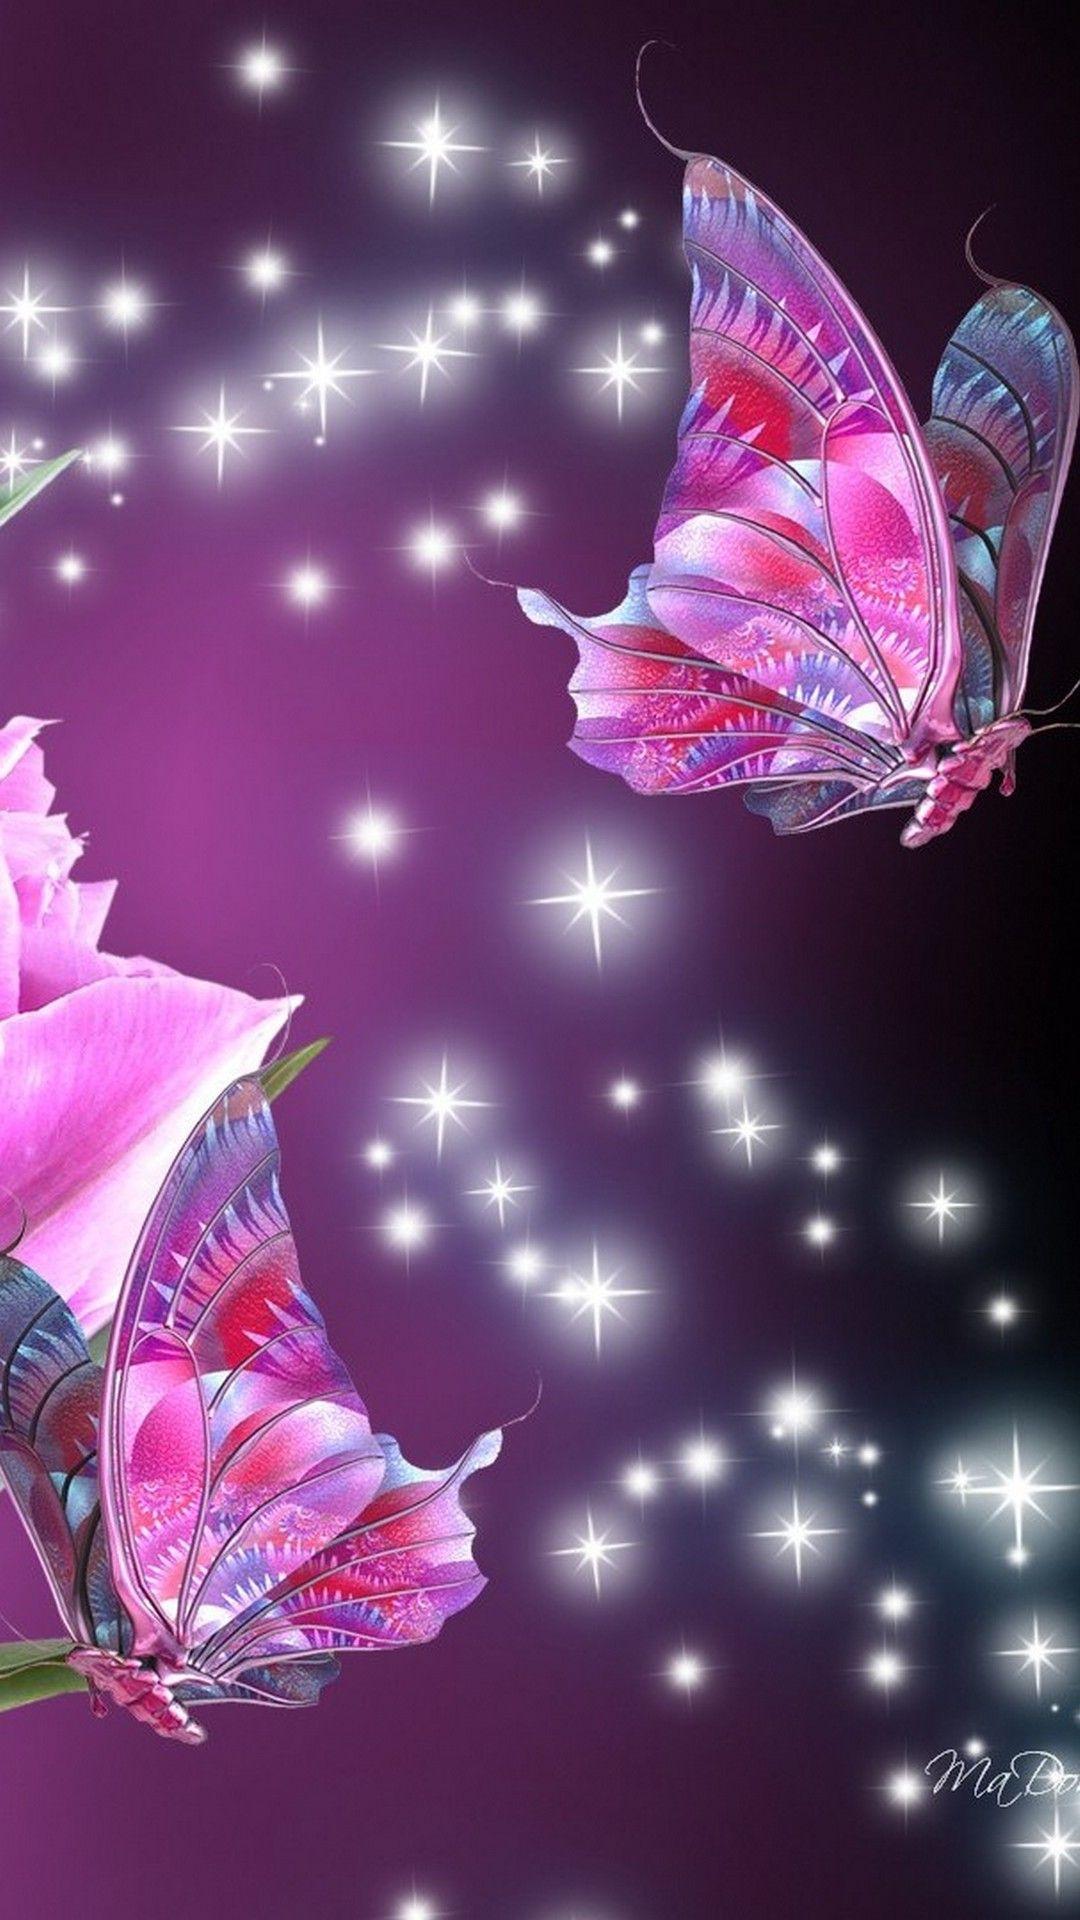 Mobilewallpaper Butterfly Wallpaper Backgrounds Butterfly Background Butterfly Wallpaper